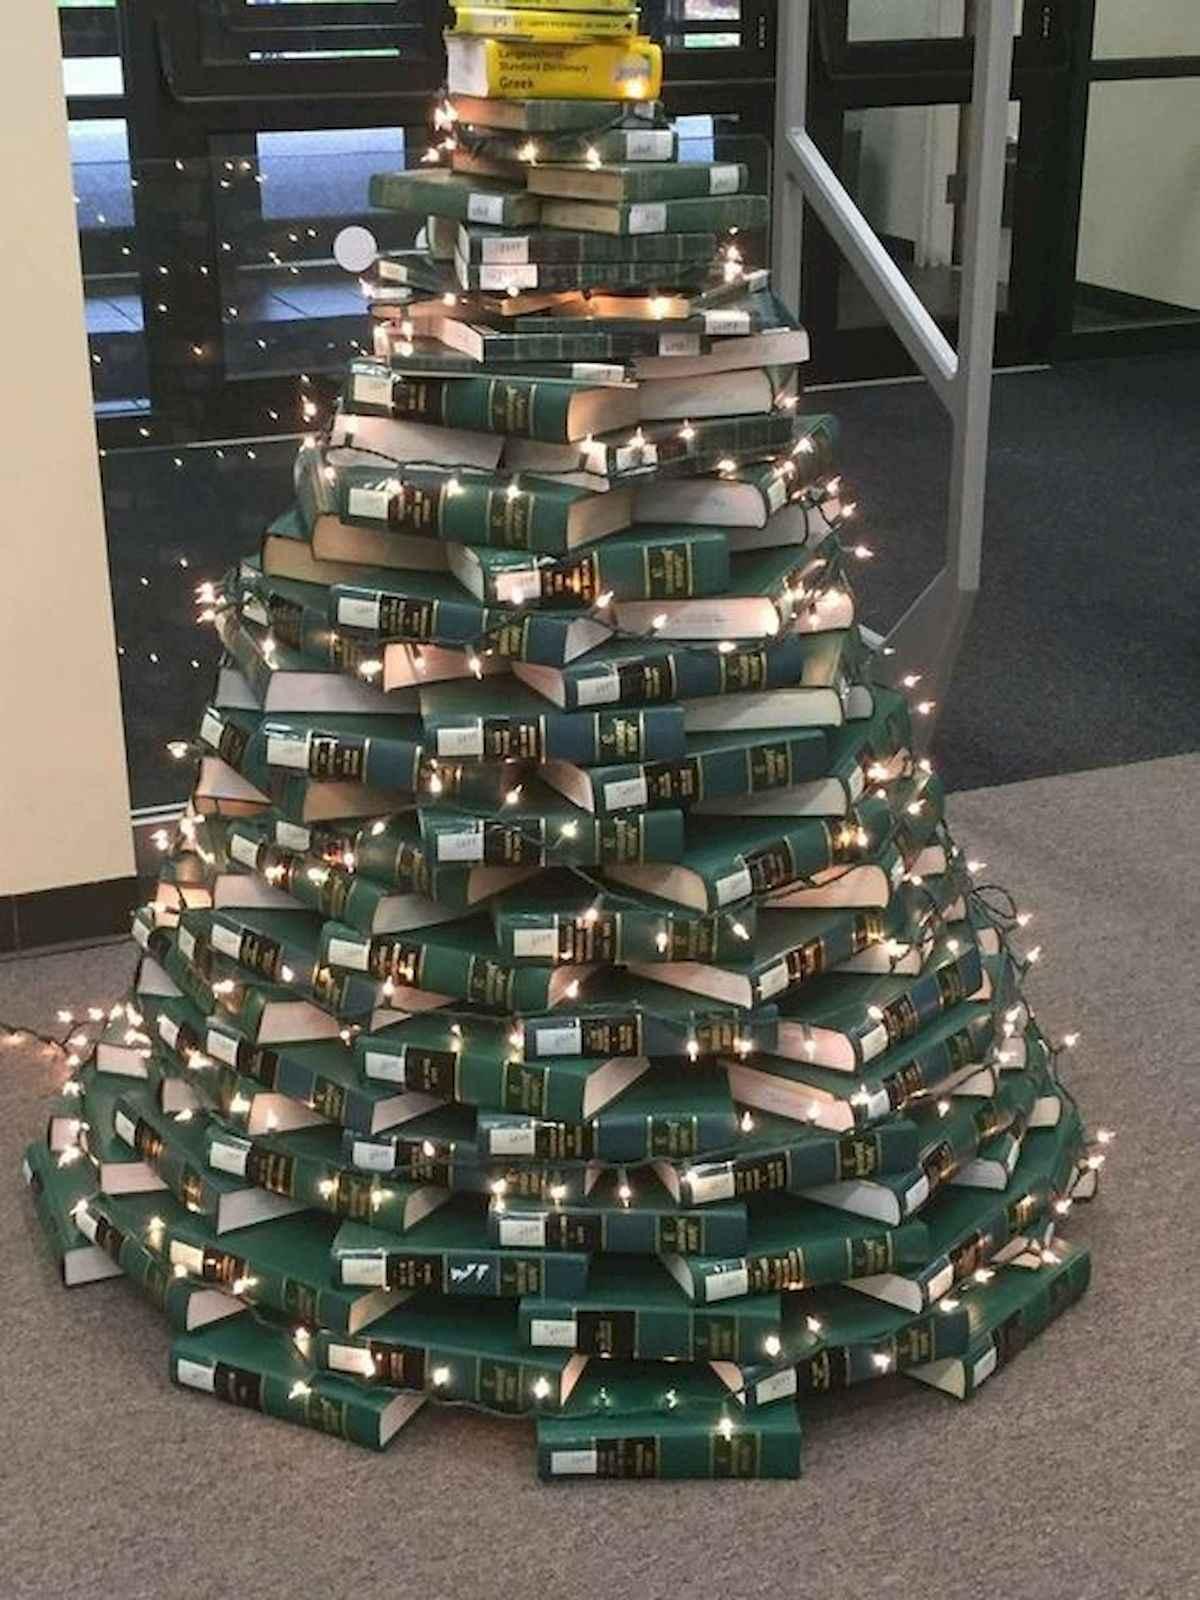 40 unique christmas tree ideas decorations (27)